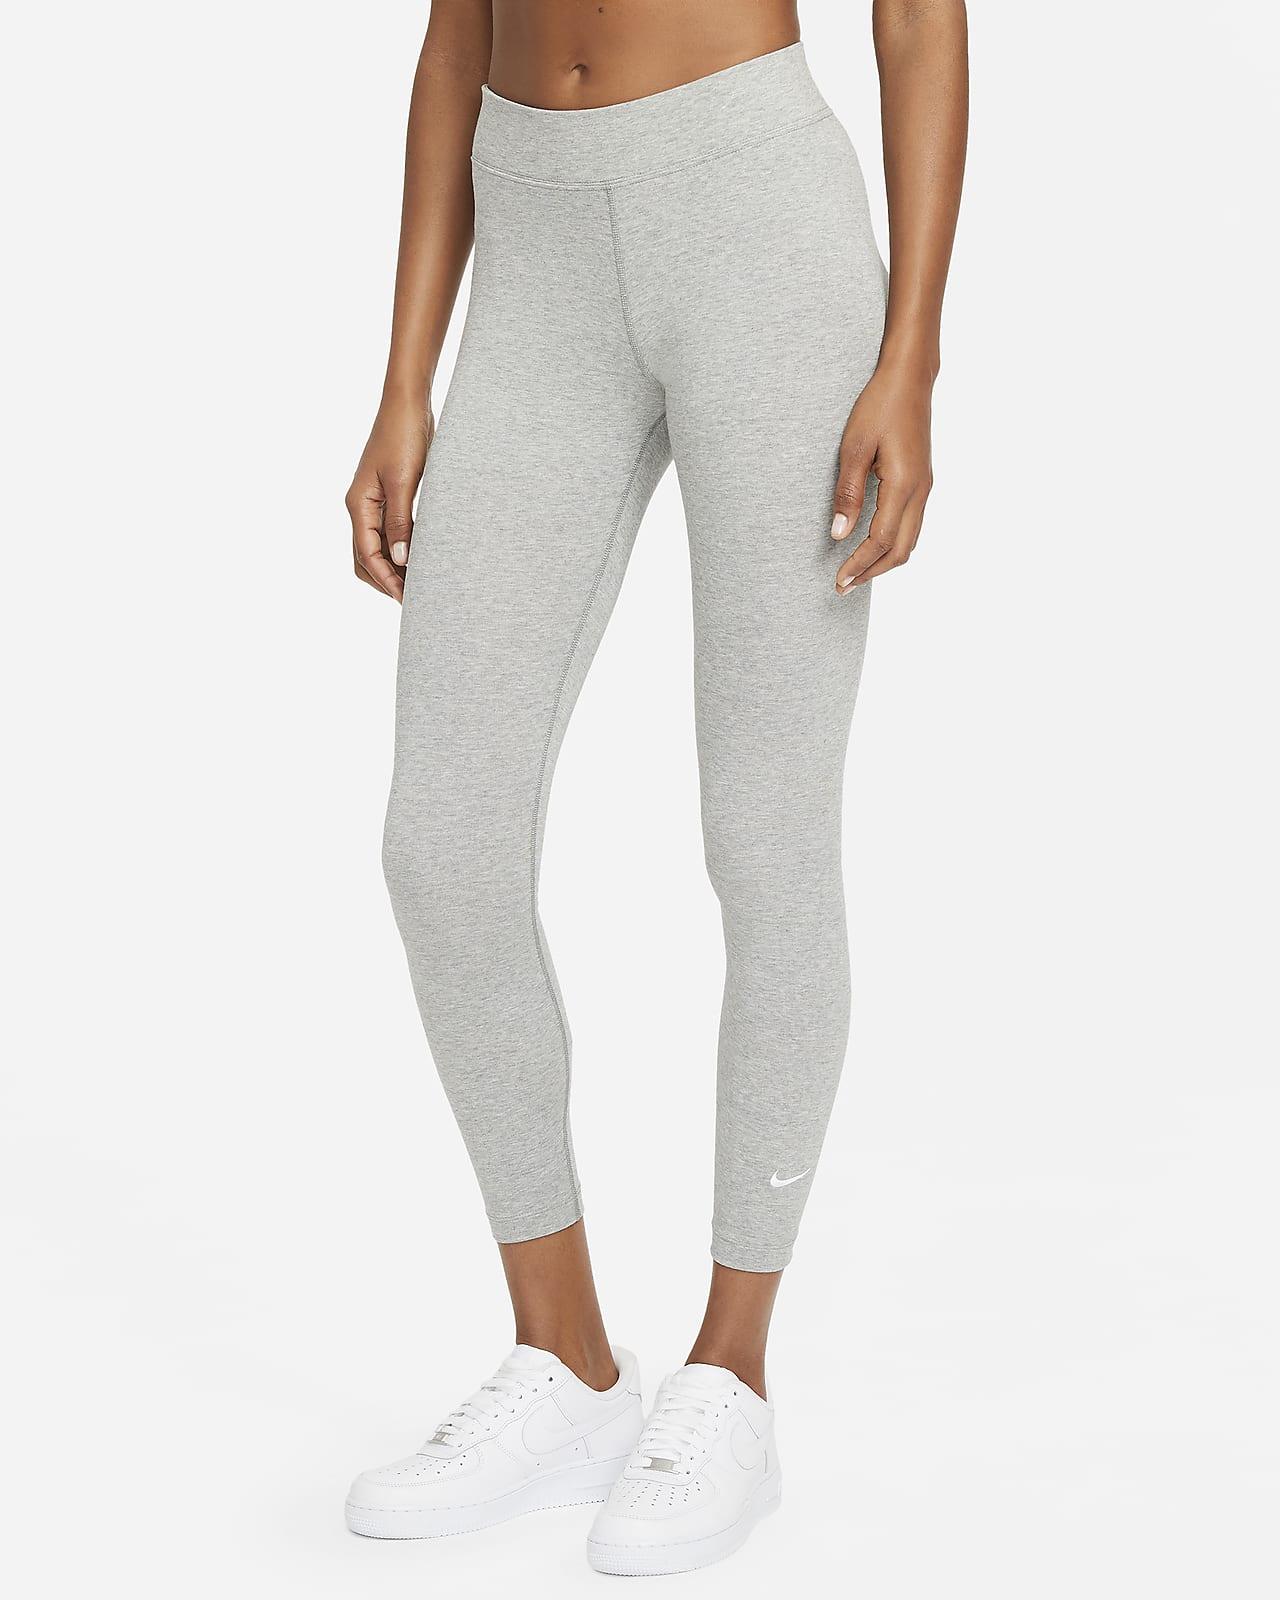 Legging 7/8 taille mi-haute Nike Sportswear Essential pour Femme